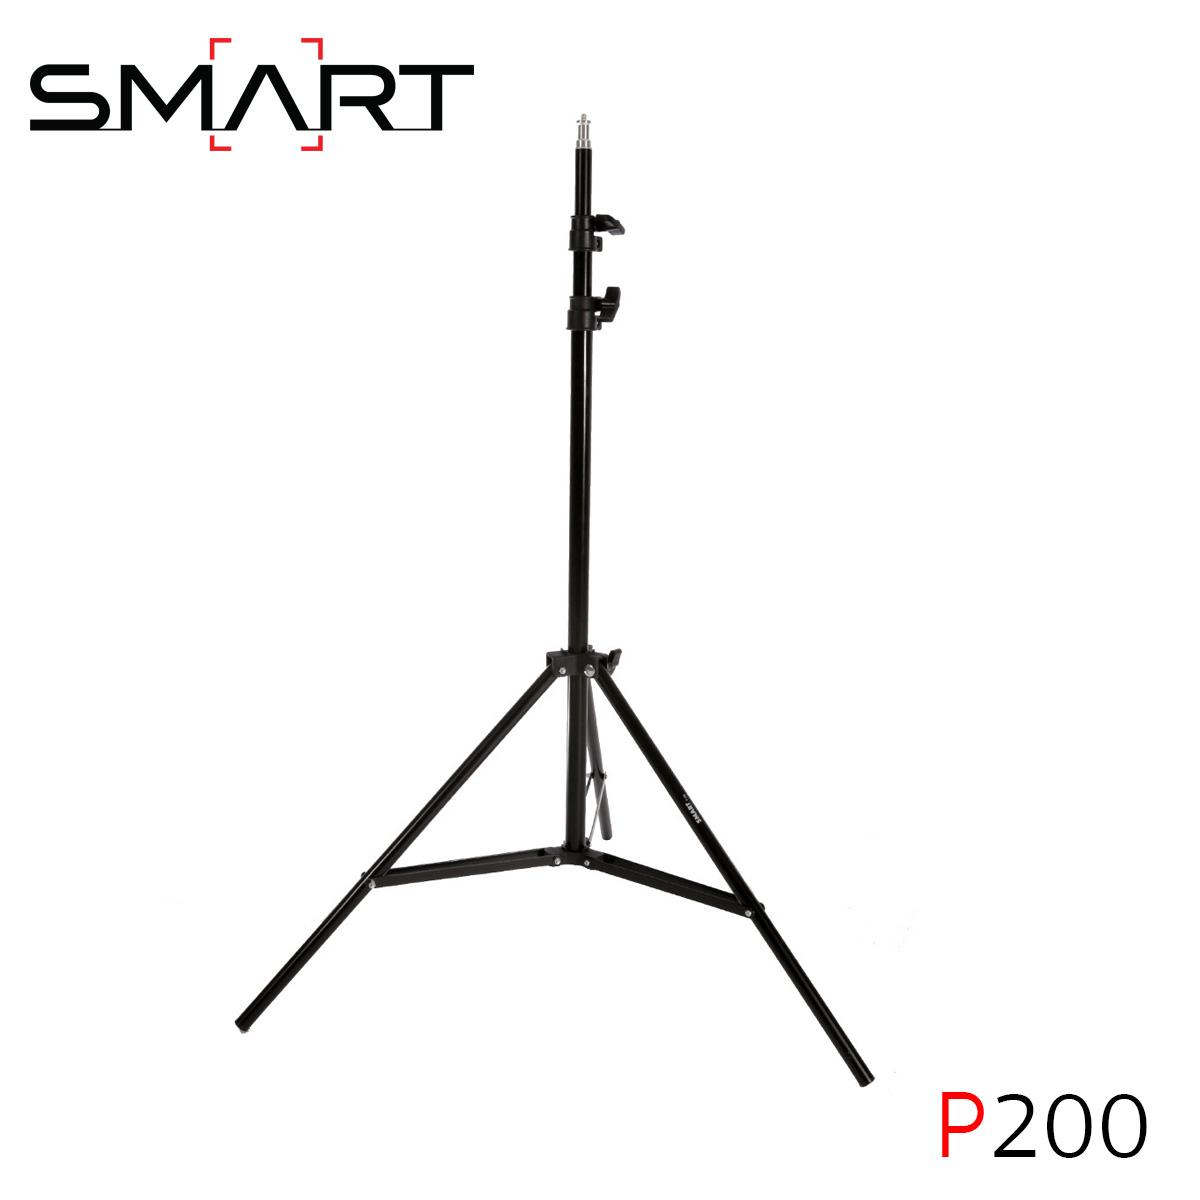 SMART Light Stand P200 ขาตั้งไฟ (200cm)